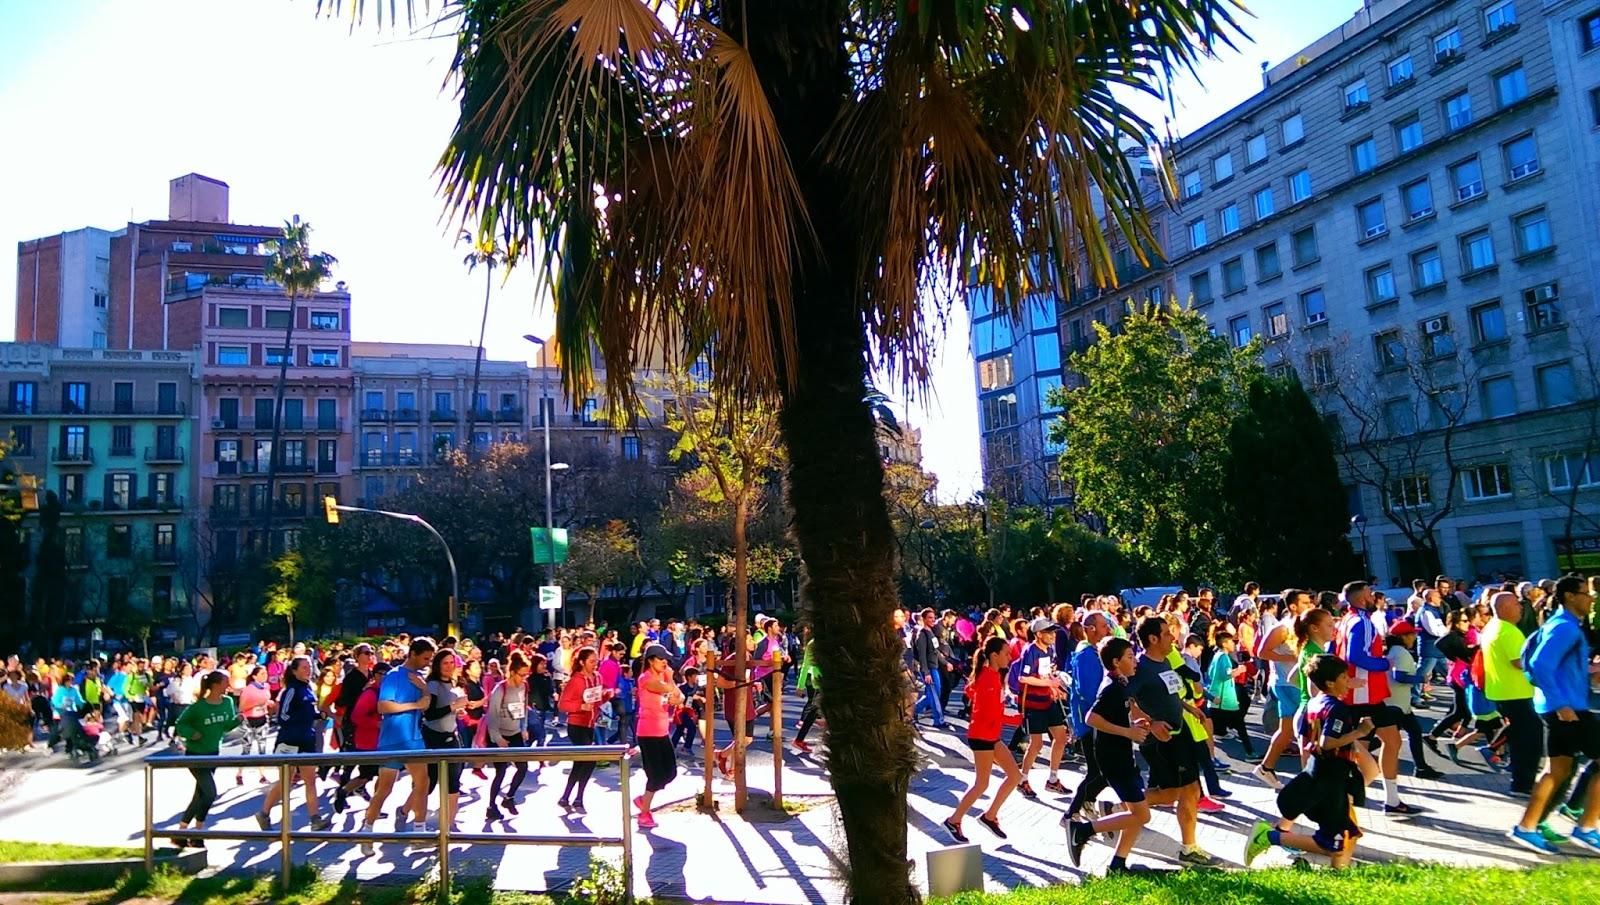 Barcelona, carrera popular en plaza Letamendi, desde la bici